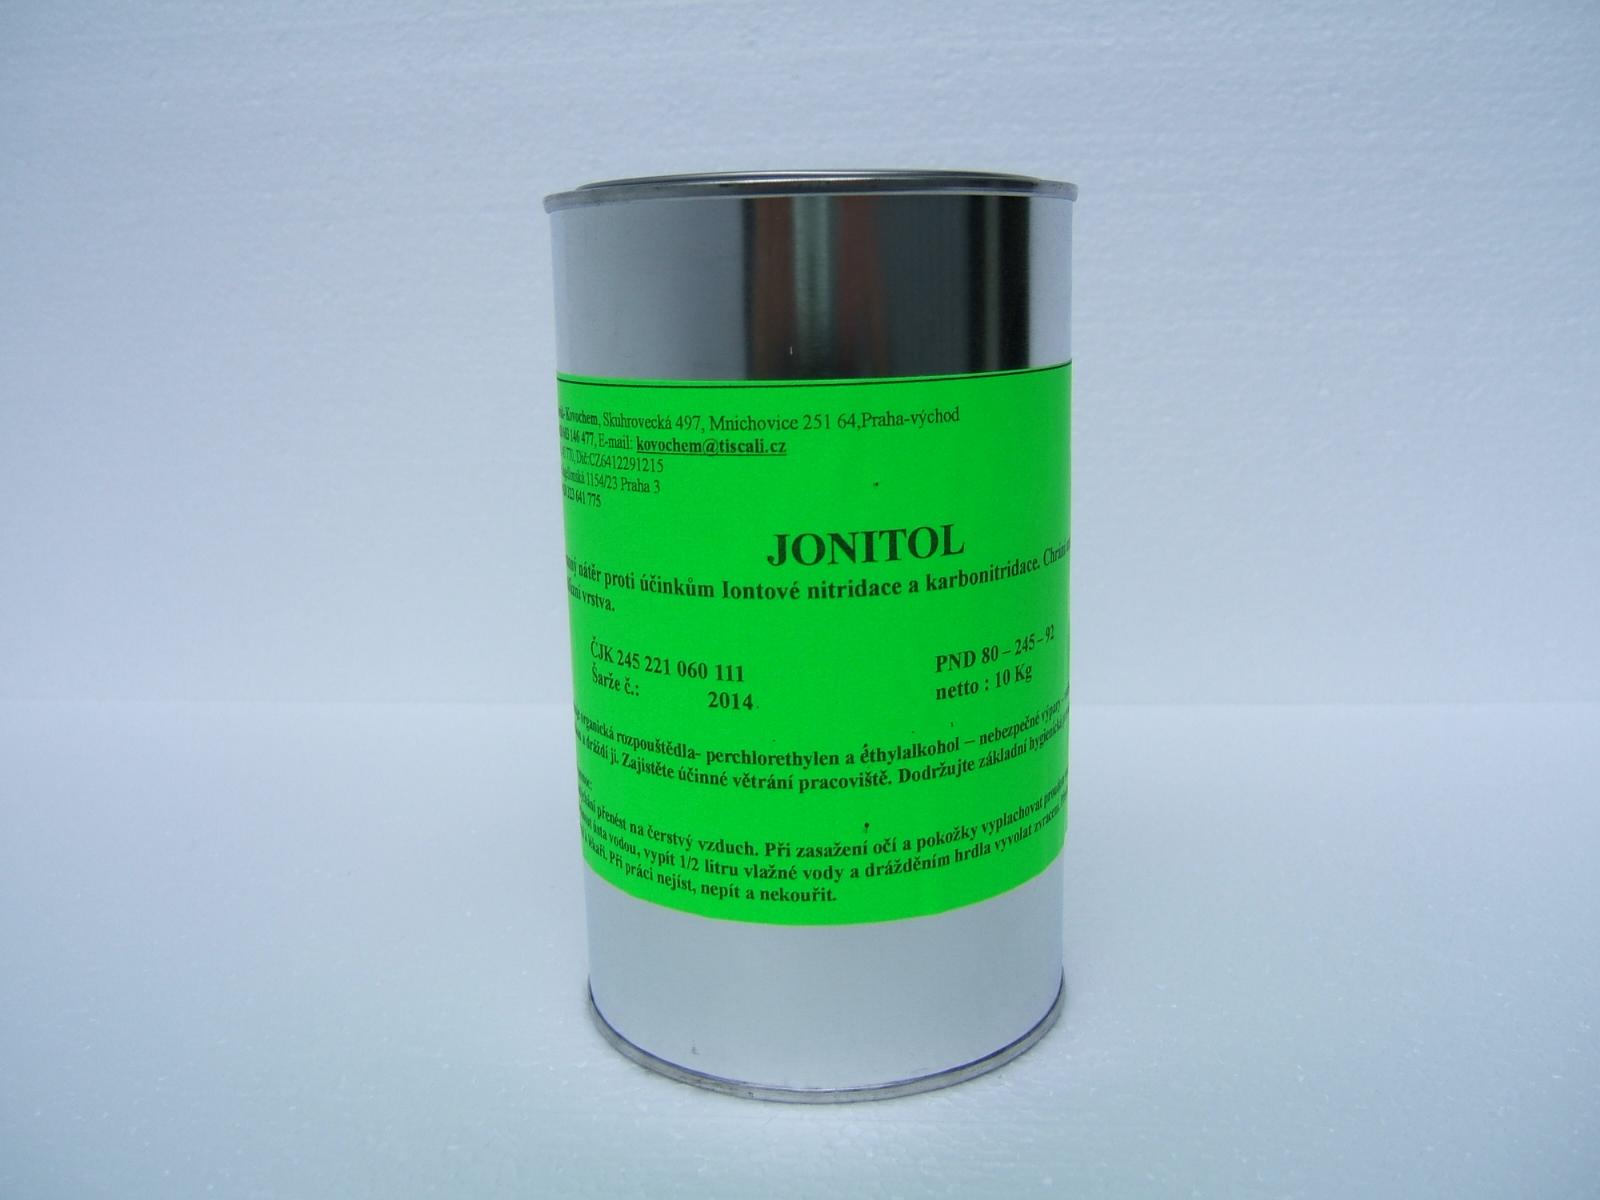 Jonitol